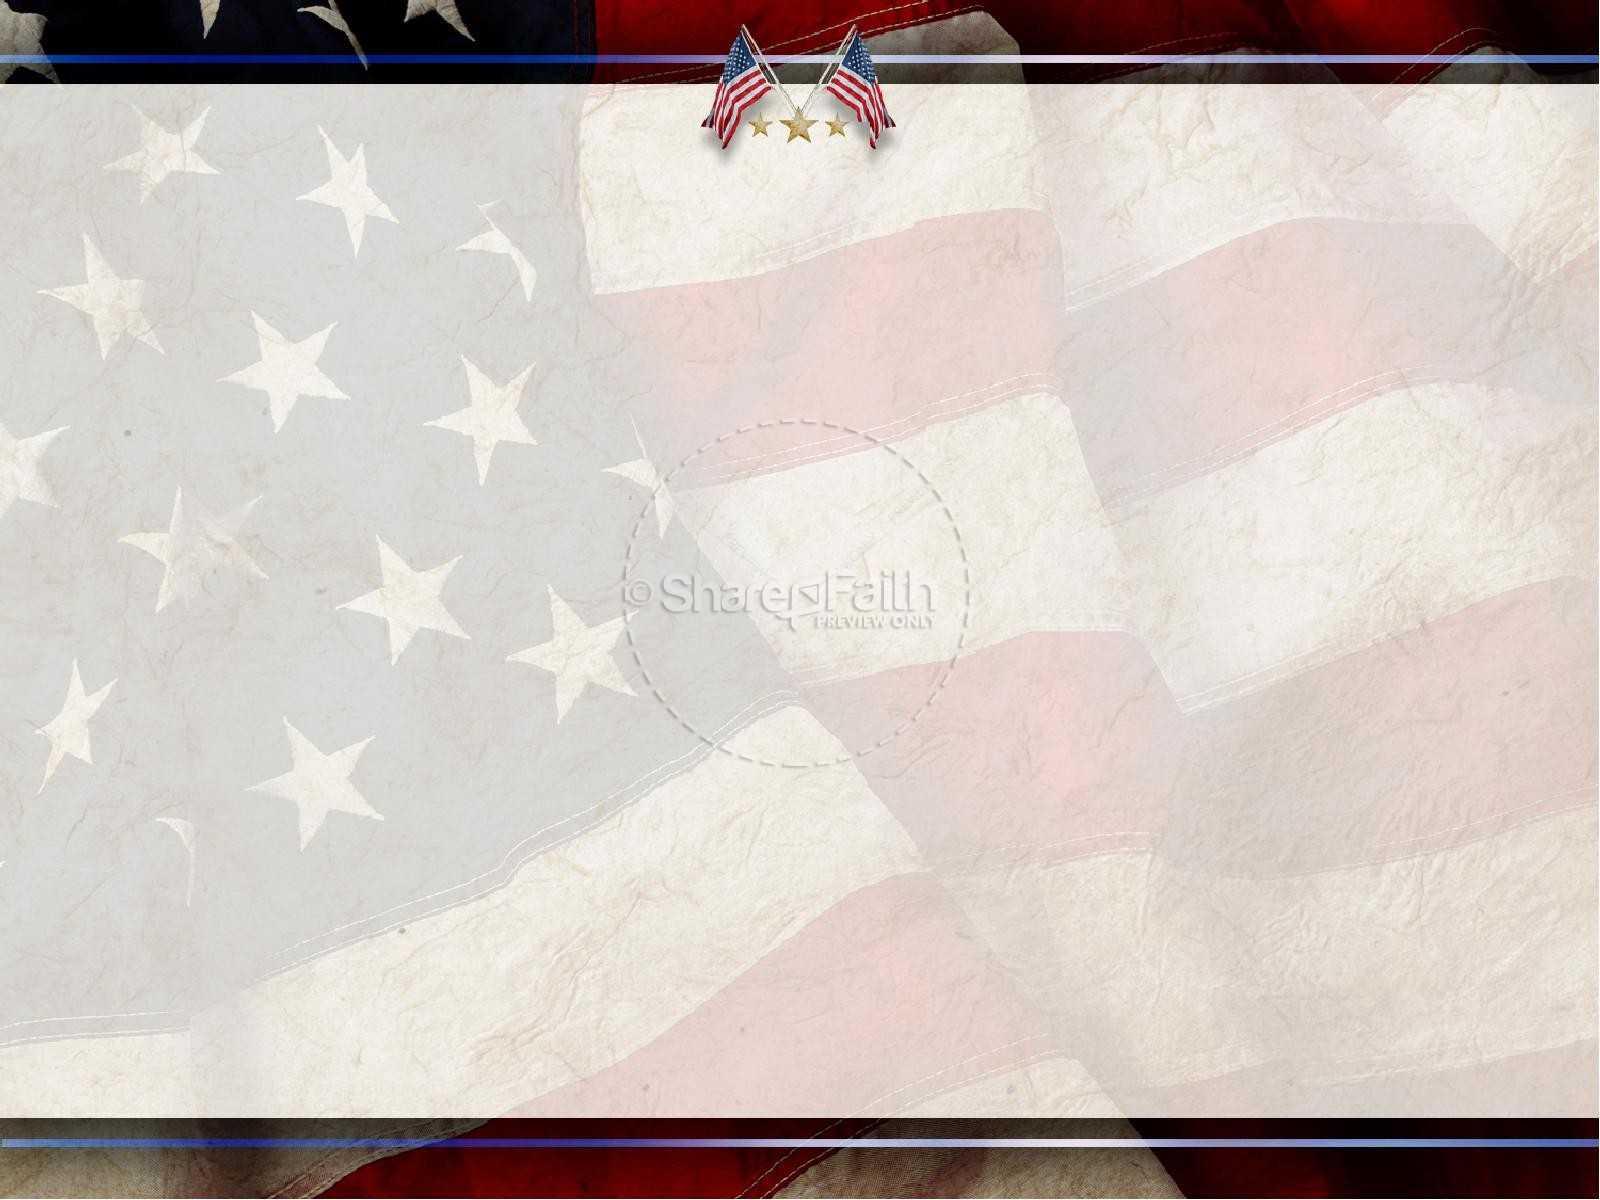 Patriotic Powerpoint Templates Free Powerpoint Backgrounds With Regard To Patriotic Powerpoint Template